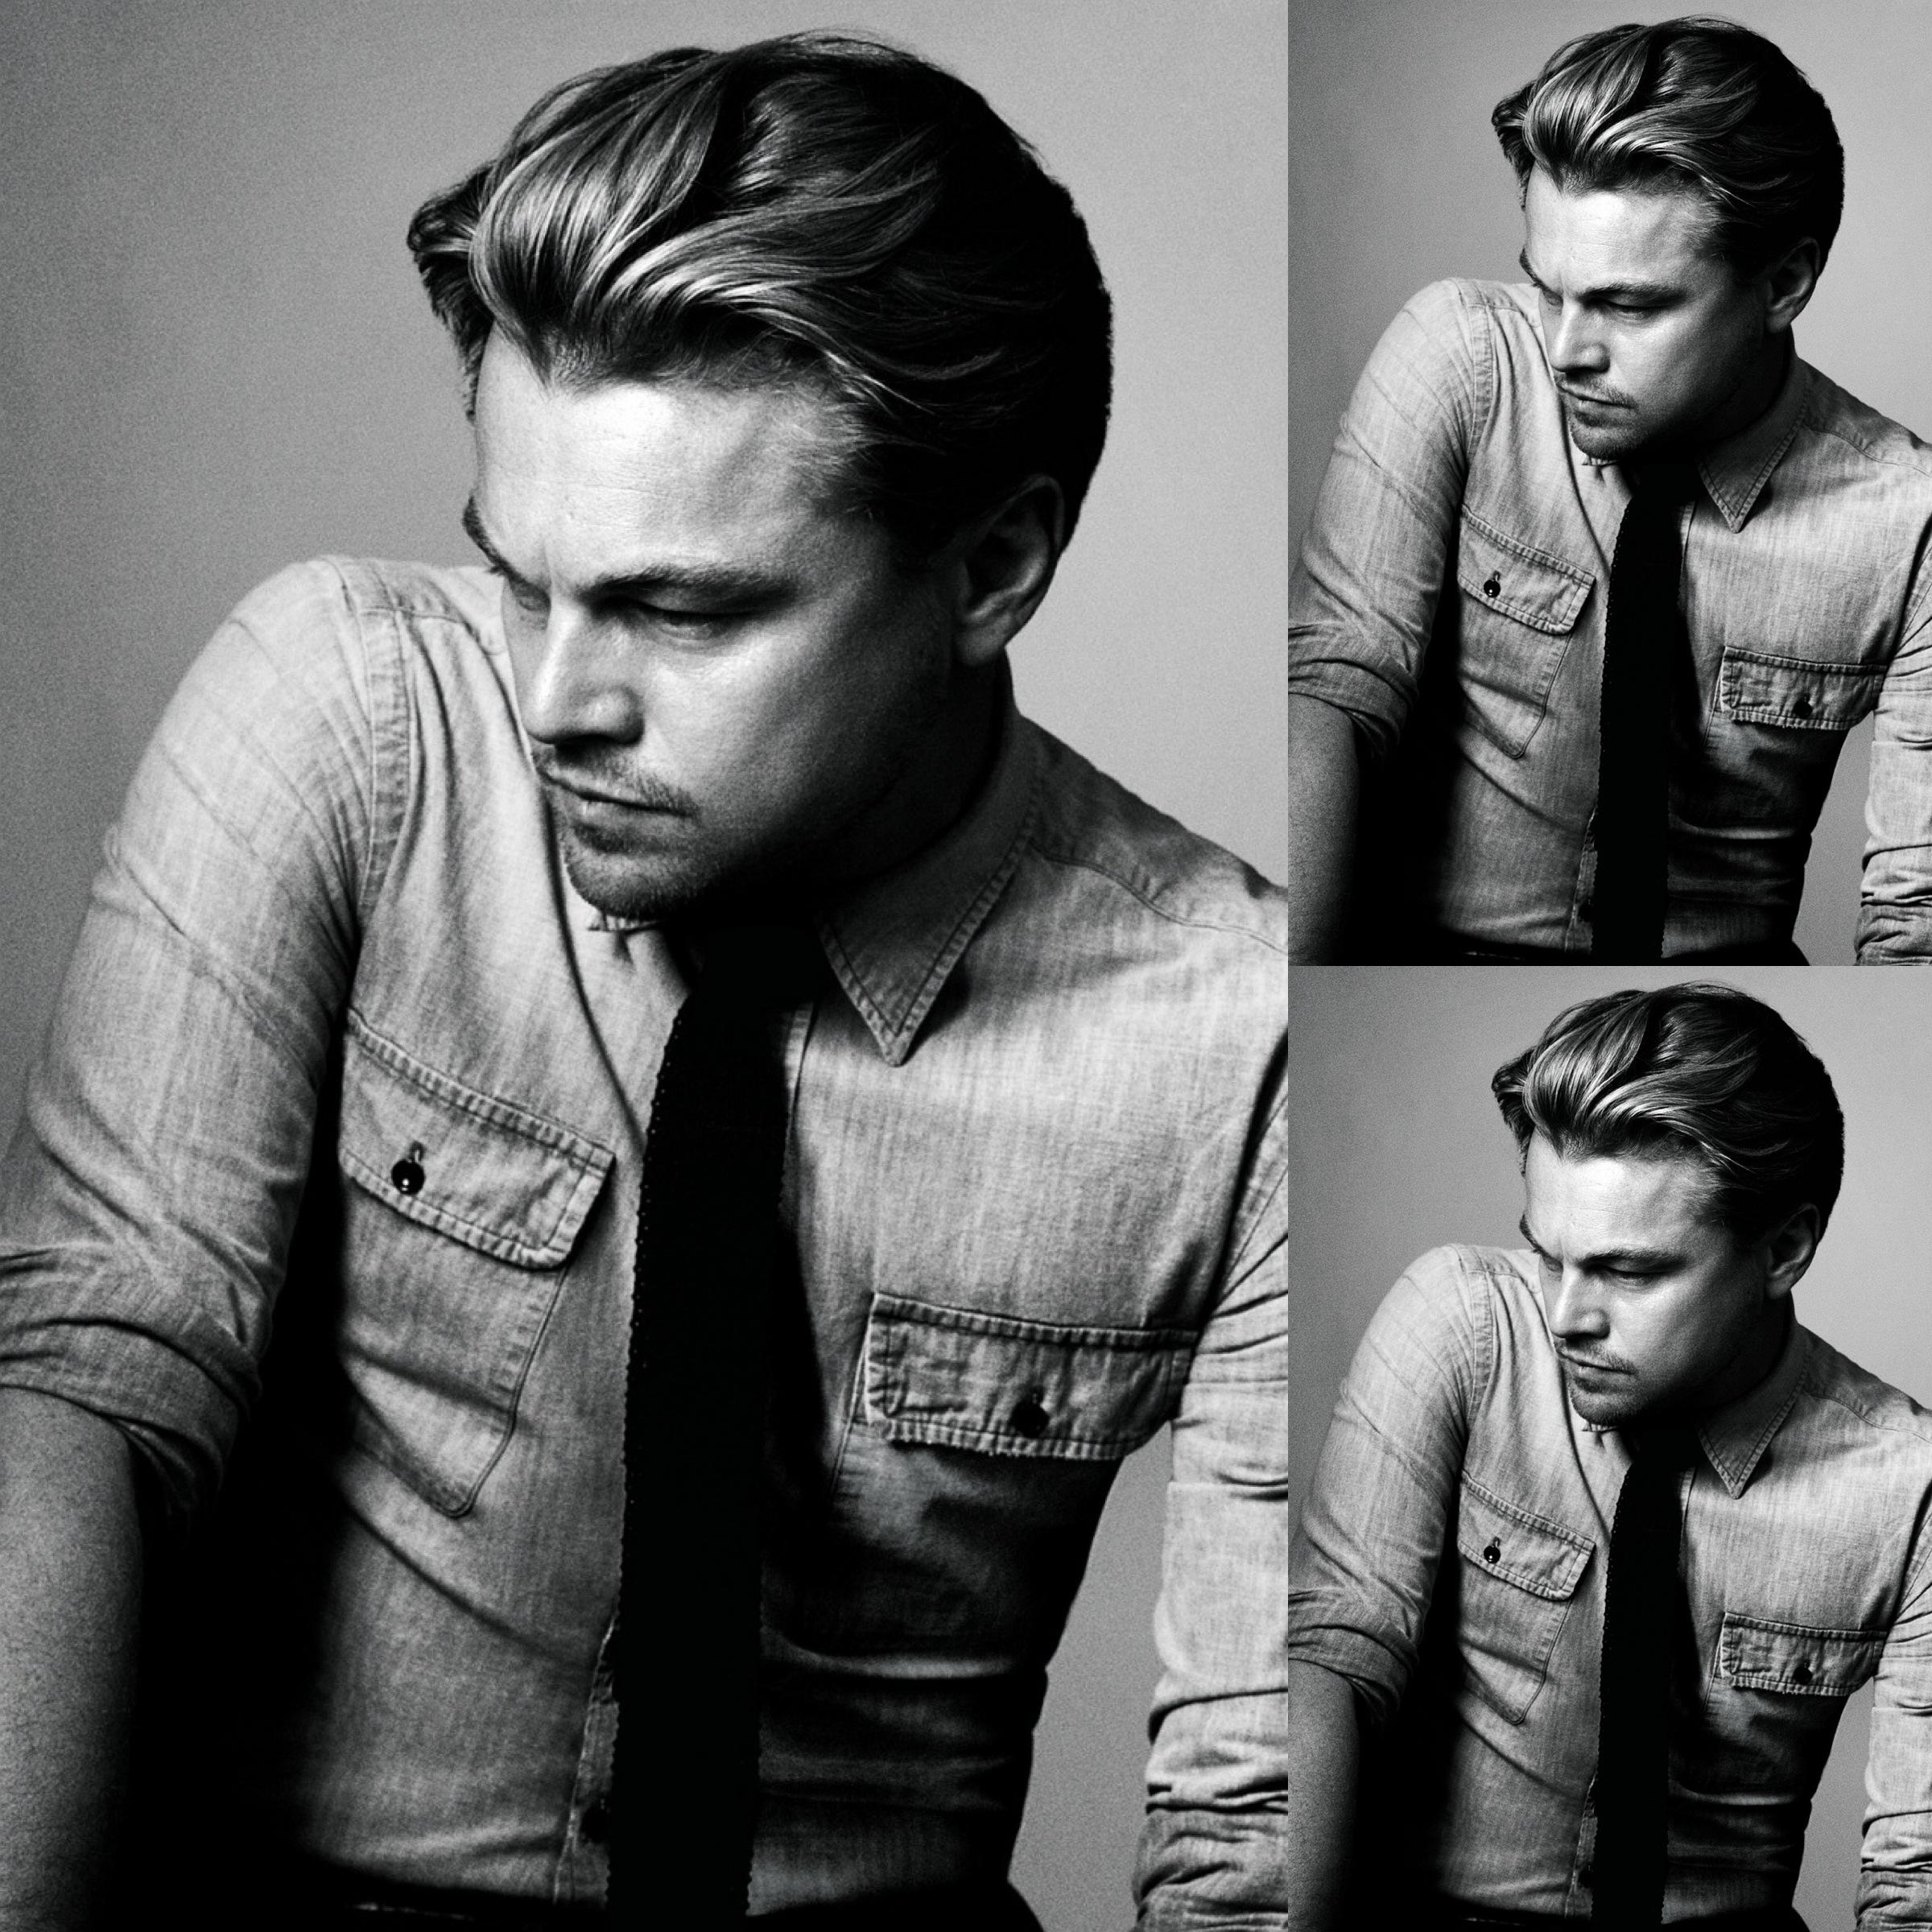 #2 (132 likes) - Leonardo Di Caprio